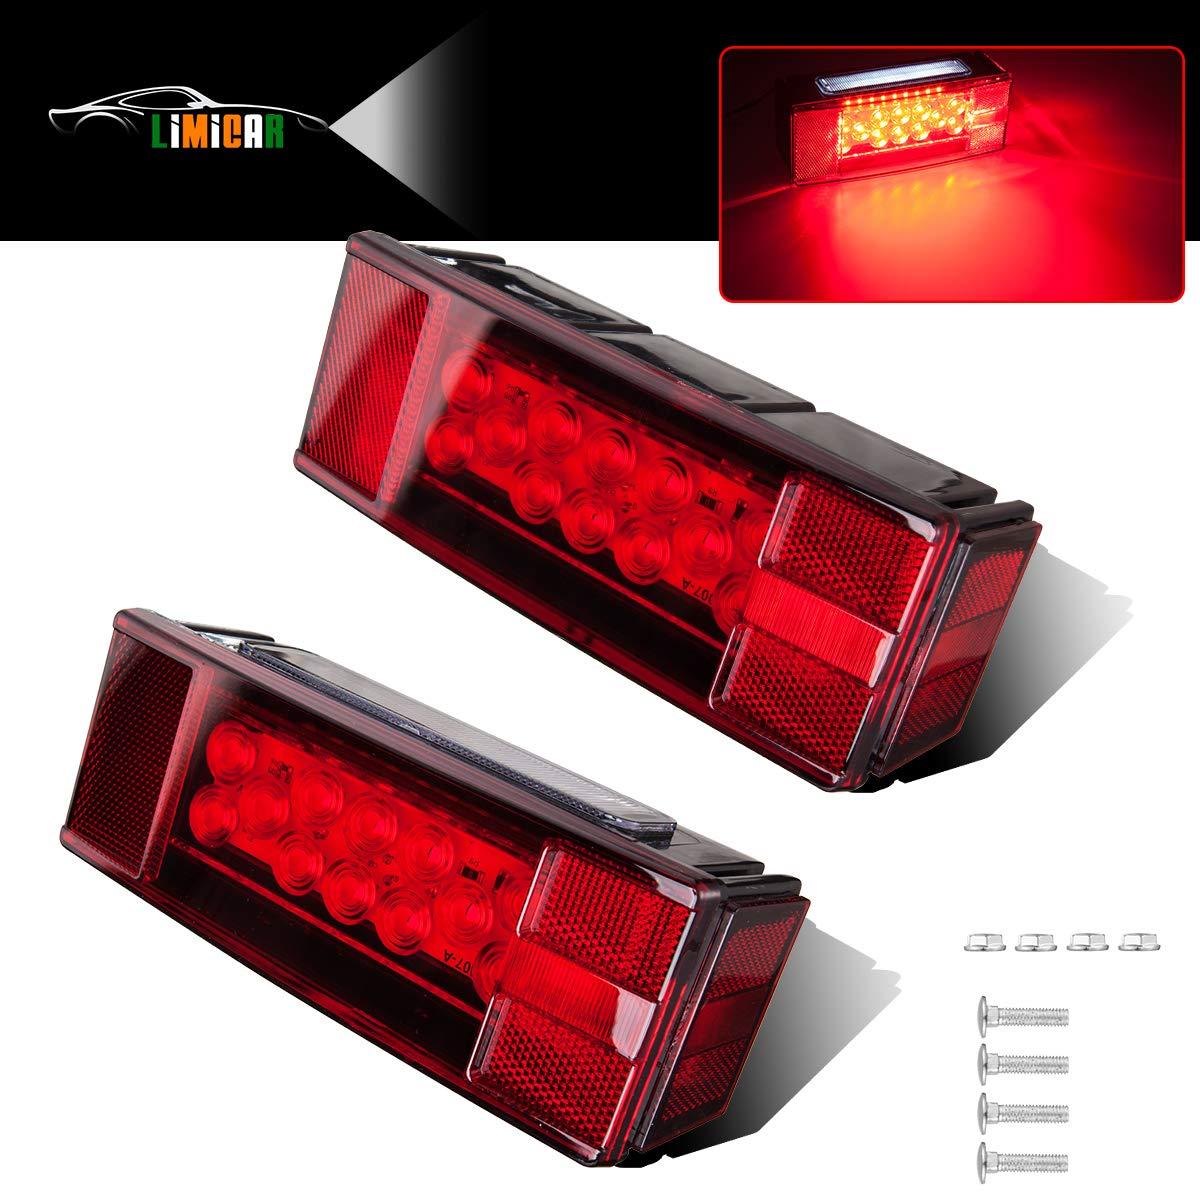 LIMICAR Rectangular LED Trailer Lights Kit Waterproof Low Profile Tail Stop Brake Turn Running License Plate Rear Lights for Trailer Truck Van Marine 12V Red (Pack of 2) by LIMICAR